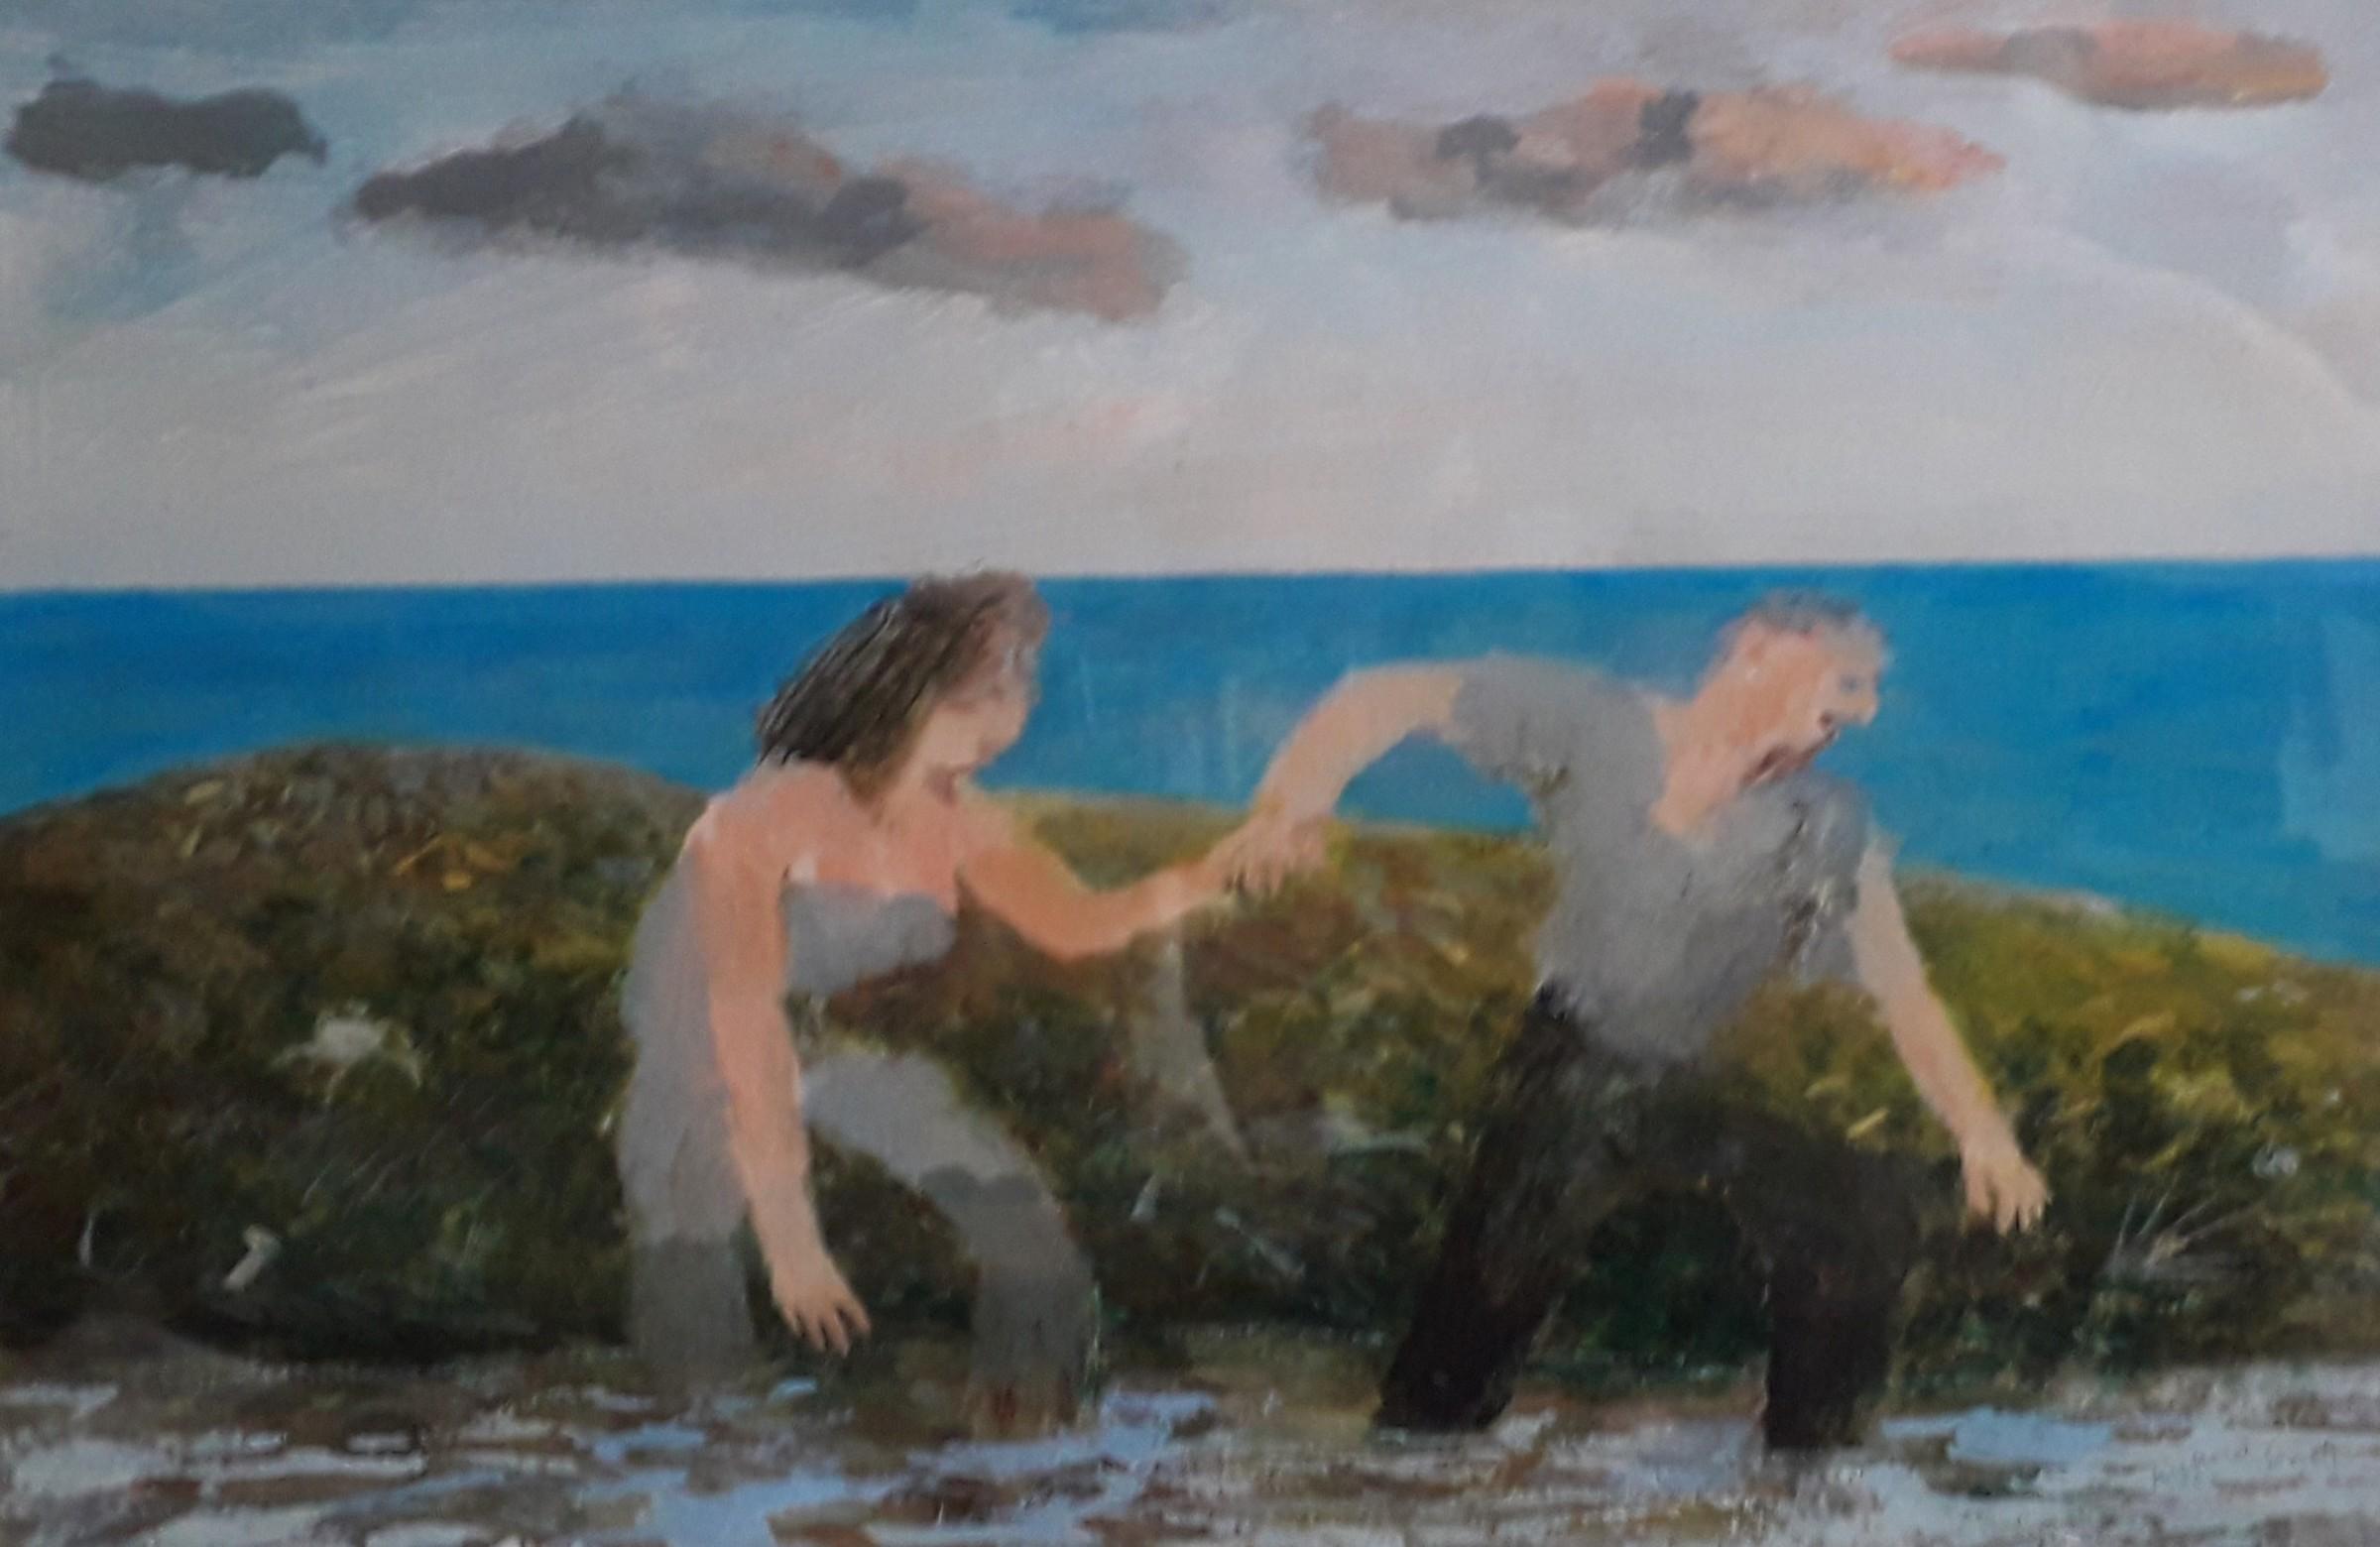 "<span class=""link fancybox-details-link""><a href=""/artists/103-richard-sorrell/works/12317-richard-sorrell-salt-marsh/"">View Detail Page</a></span><div class=""artist""><span class=""artist""><strong>Richard Sorrell</strong></span></div><div class=""title""><em>Salt Marsh</em></div><div class=""medium"">acrylic</div><div class=""dimensions"">Frame: 43 x 56 cm<br /> Artwork: 27 x 40 cm</div><div class=""price"">£750.00</div>"